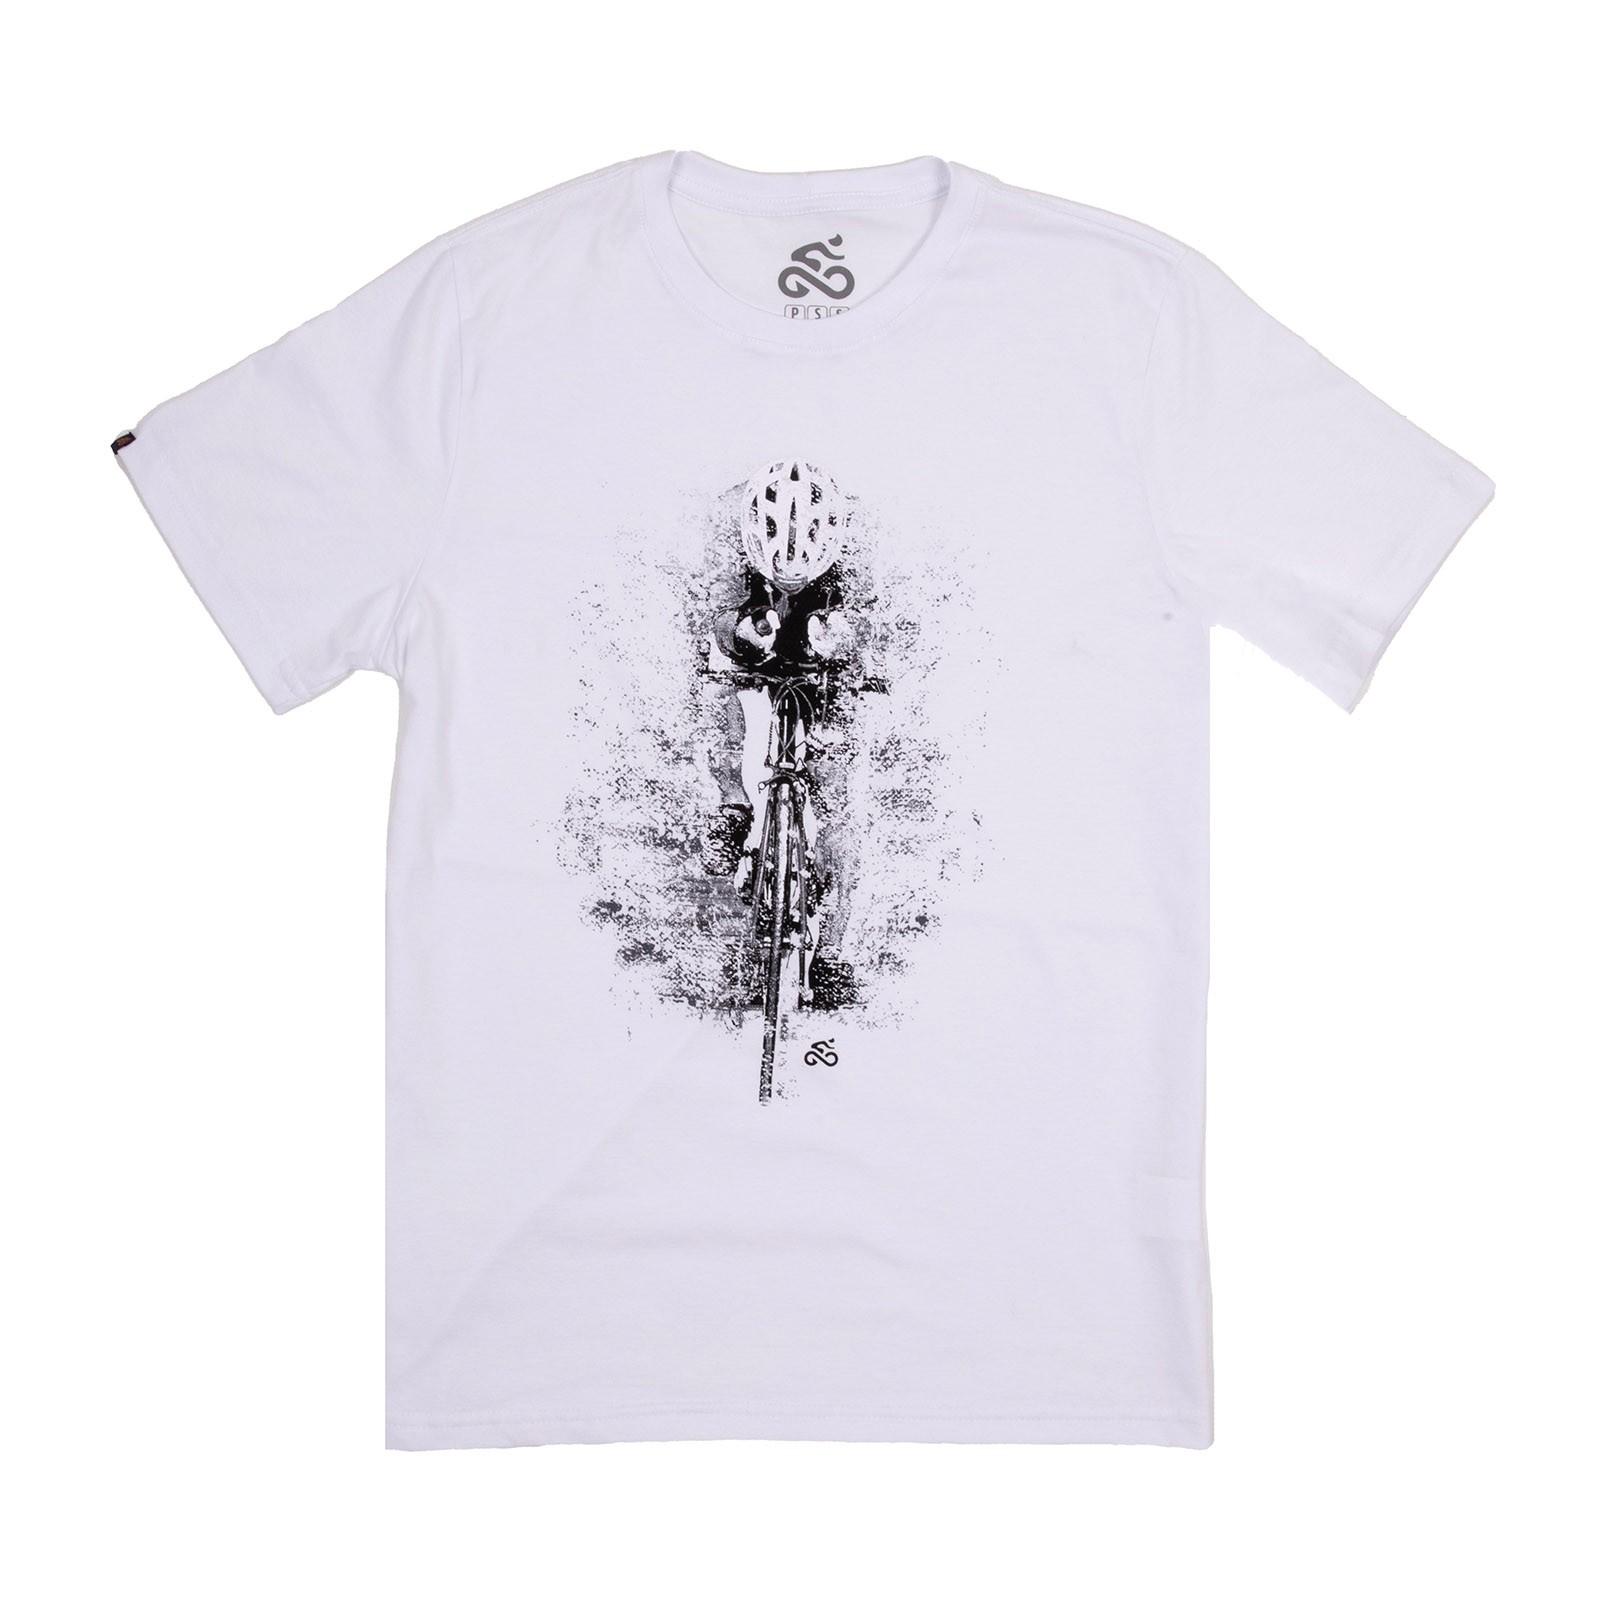 Camiseta Casual Go Bike Contrarrelógio Branca